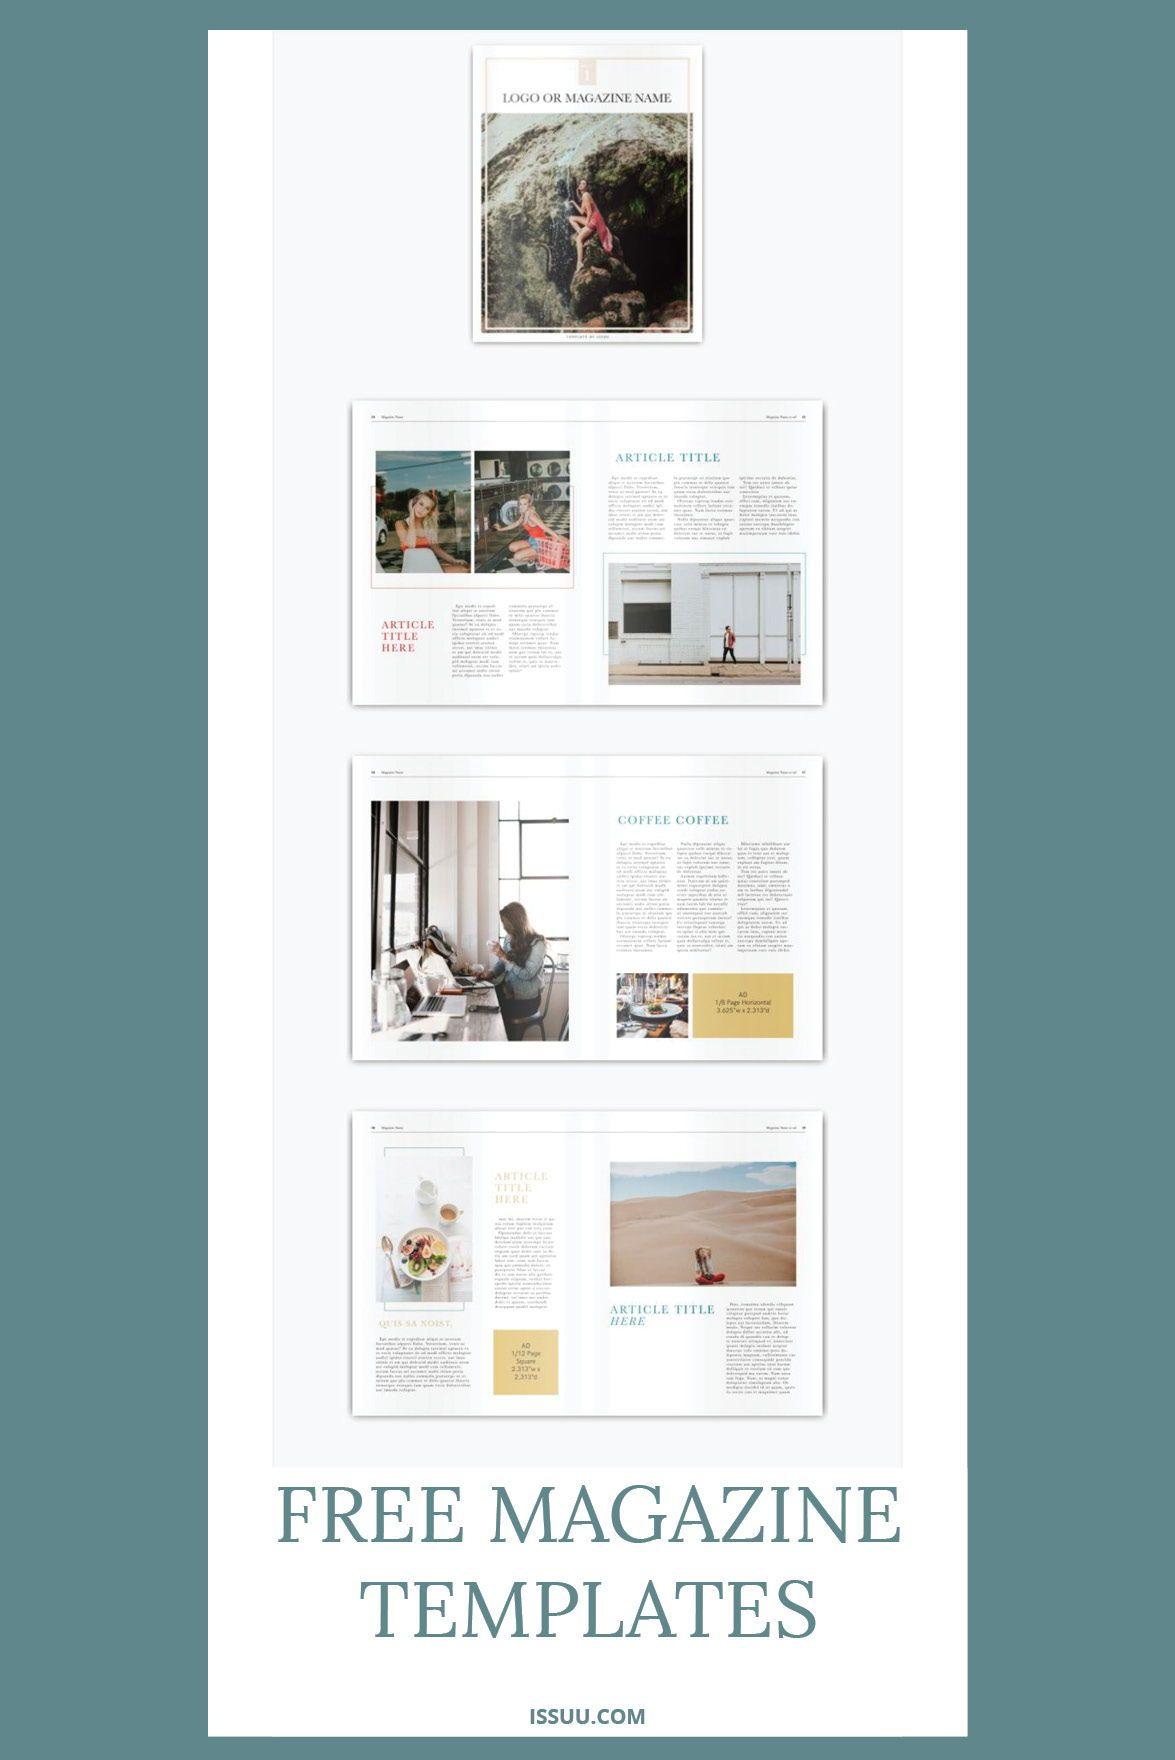 Free Download Online Magazine Templates Adobe Magazine Creator